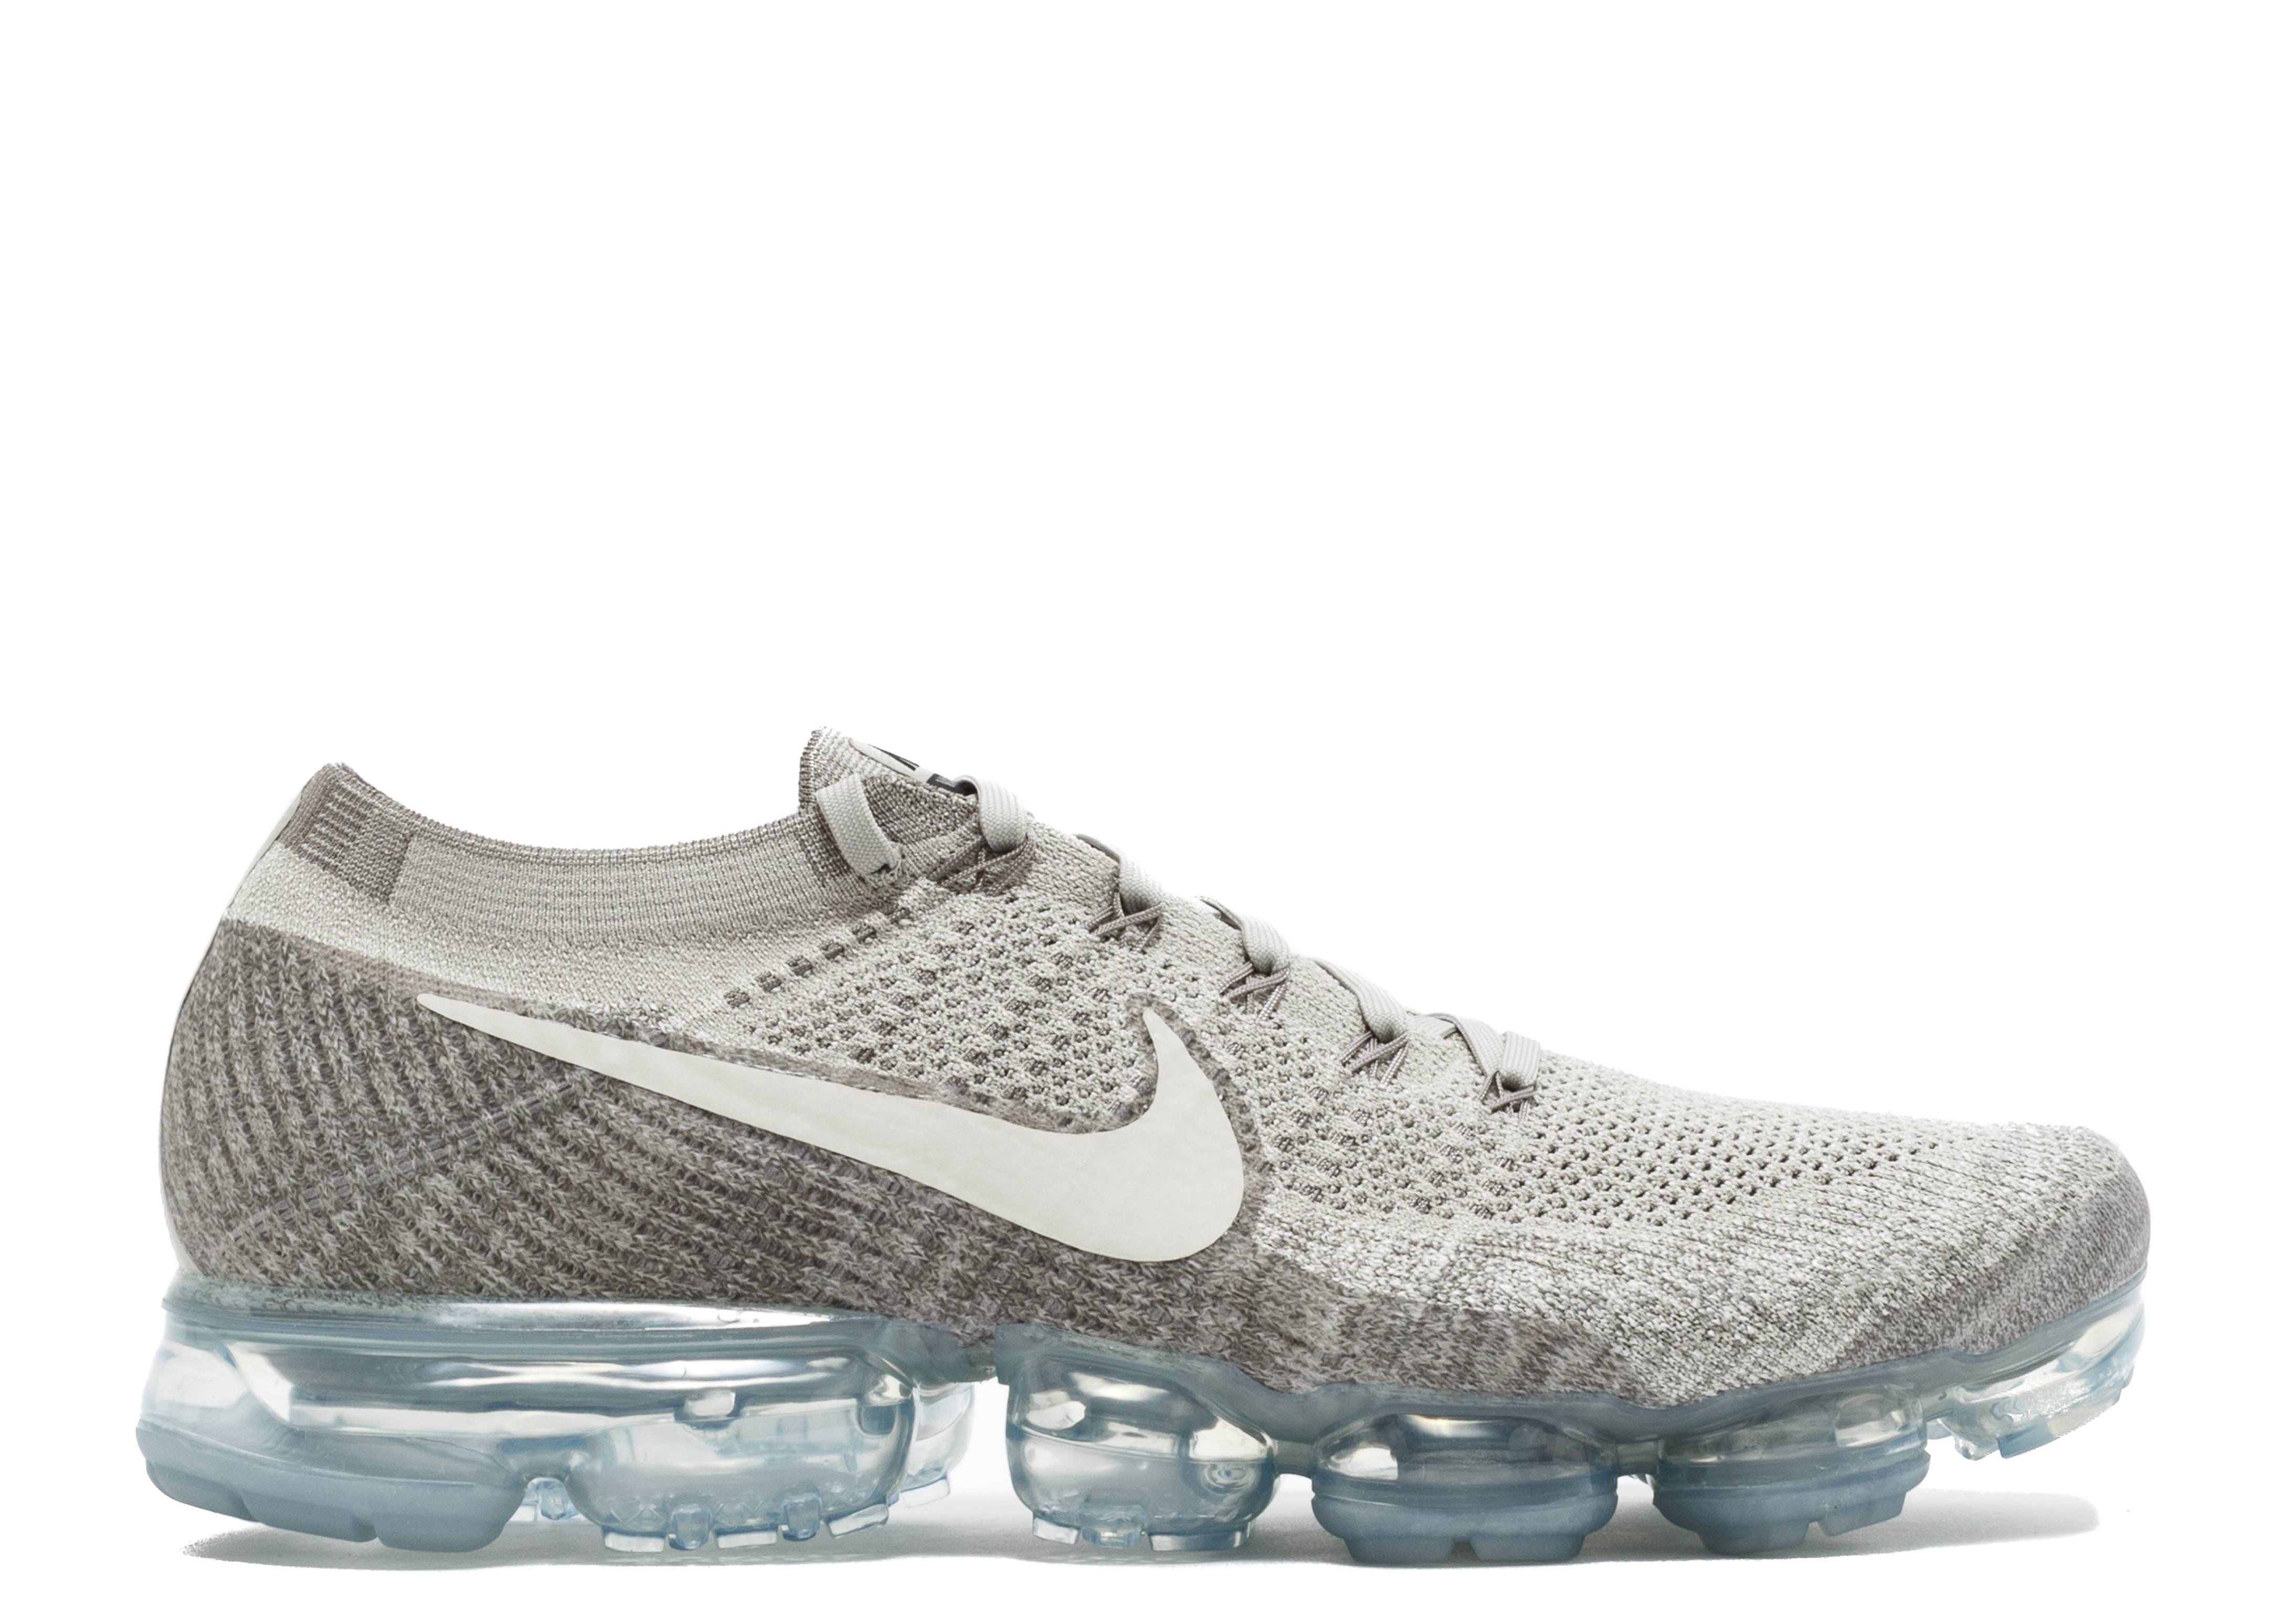 Nike Air Vapormax Flyknit: Pale Grey | Kicks in 2019 | Nike